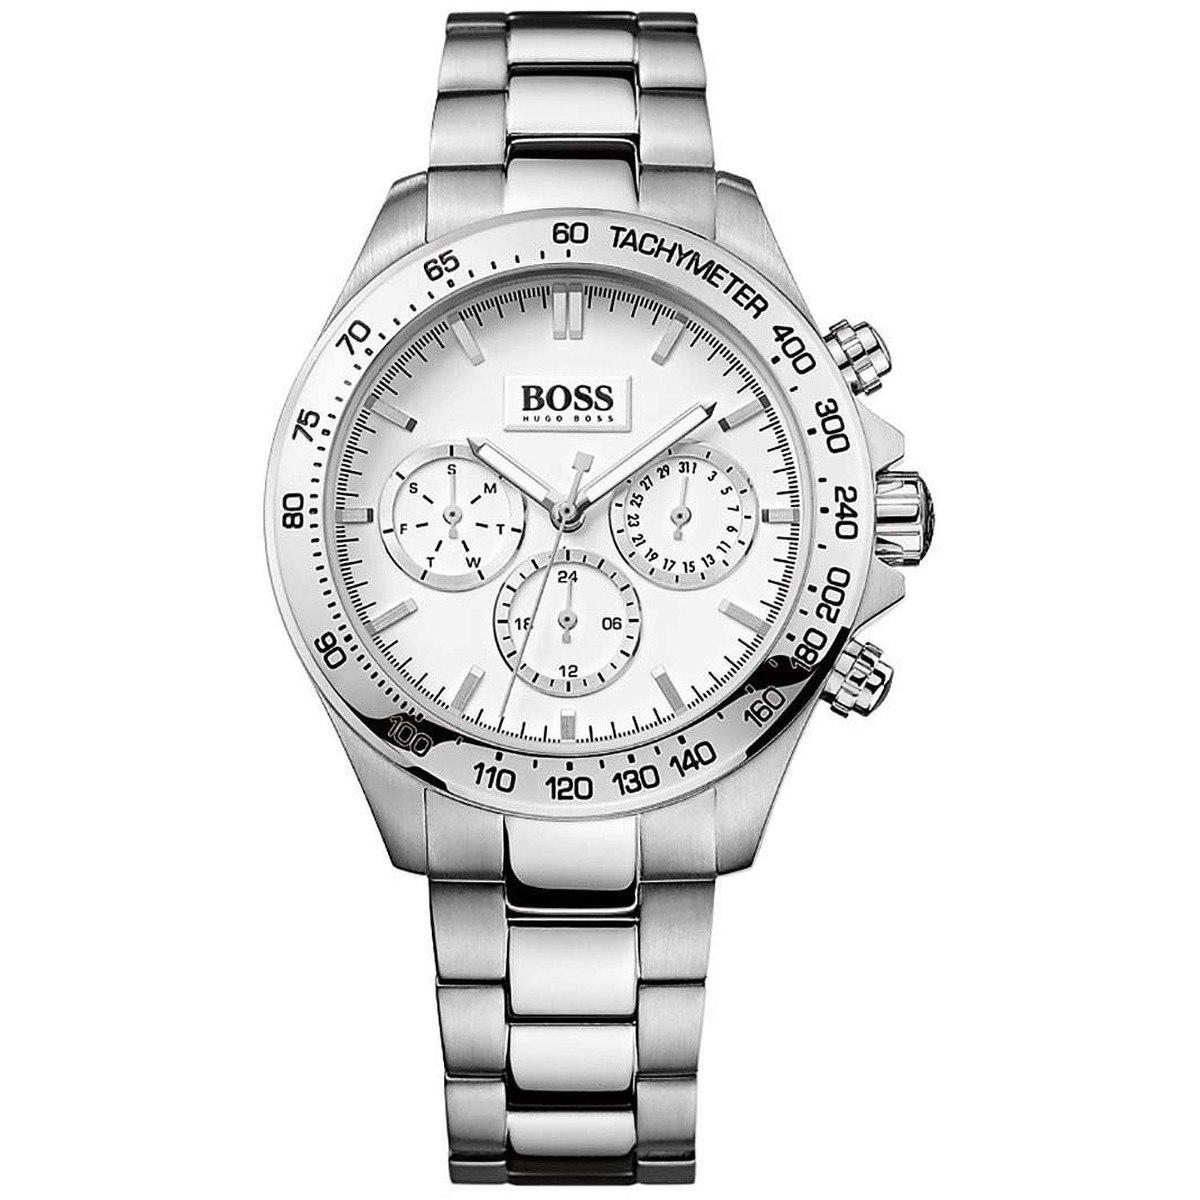 180013b7c9e reloj hugo boss 1502369 mujer envio gratis. Cargando zoom.